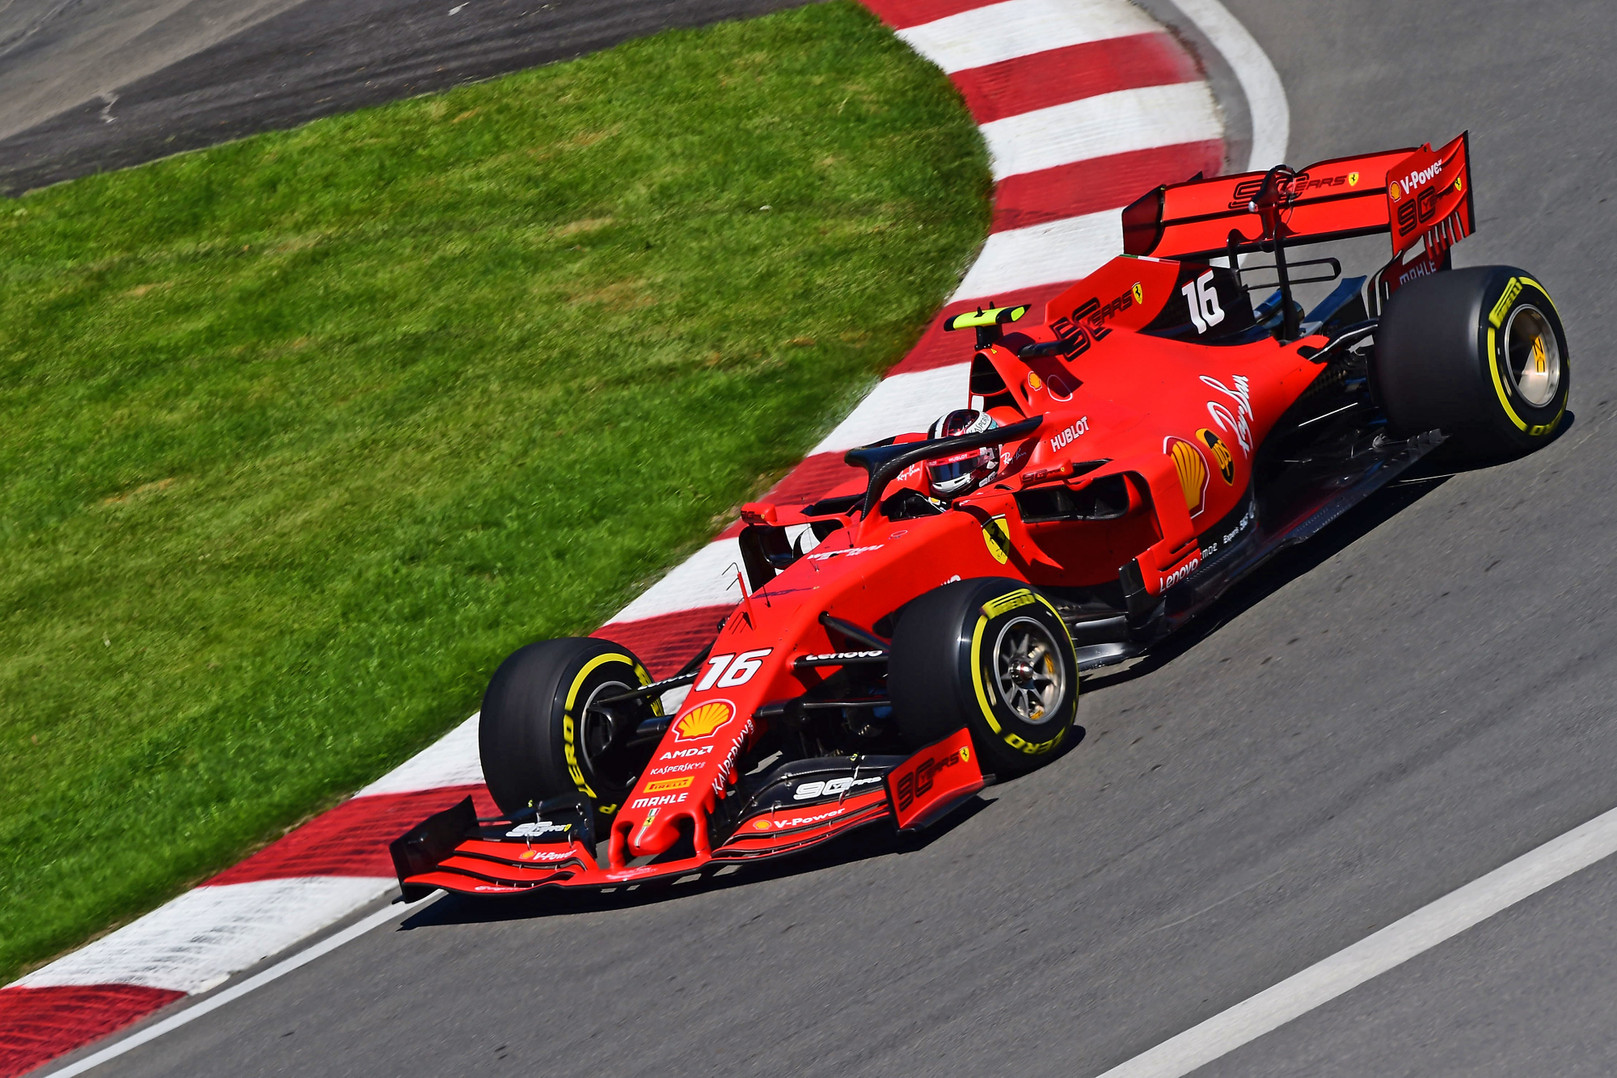 C. Leclercas patenkintas komandos progresu